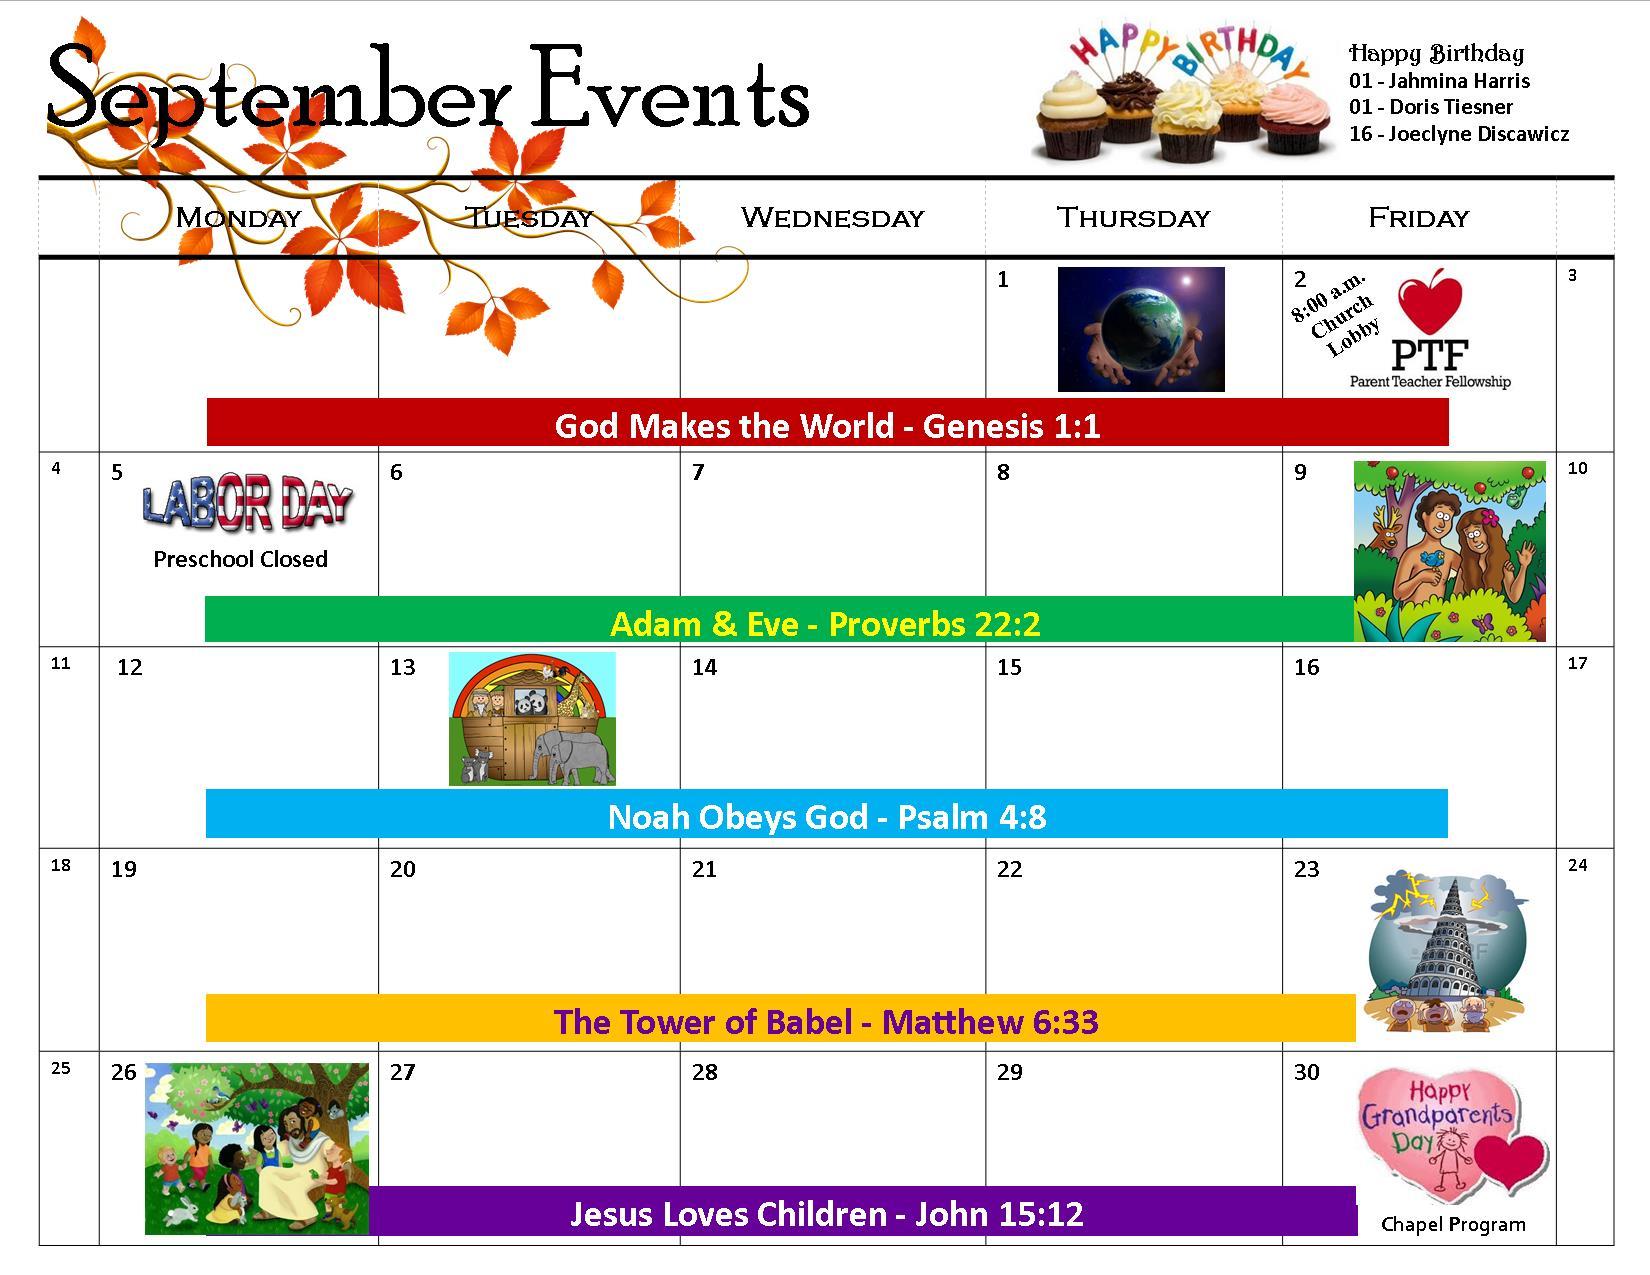 9 September 2016 Event web